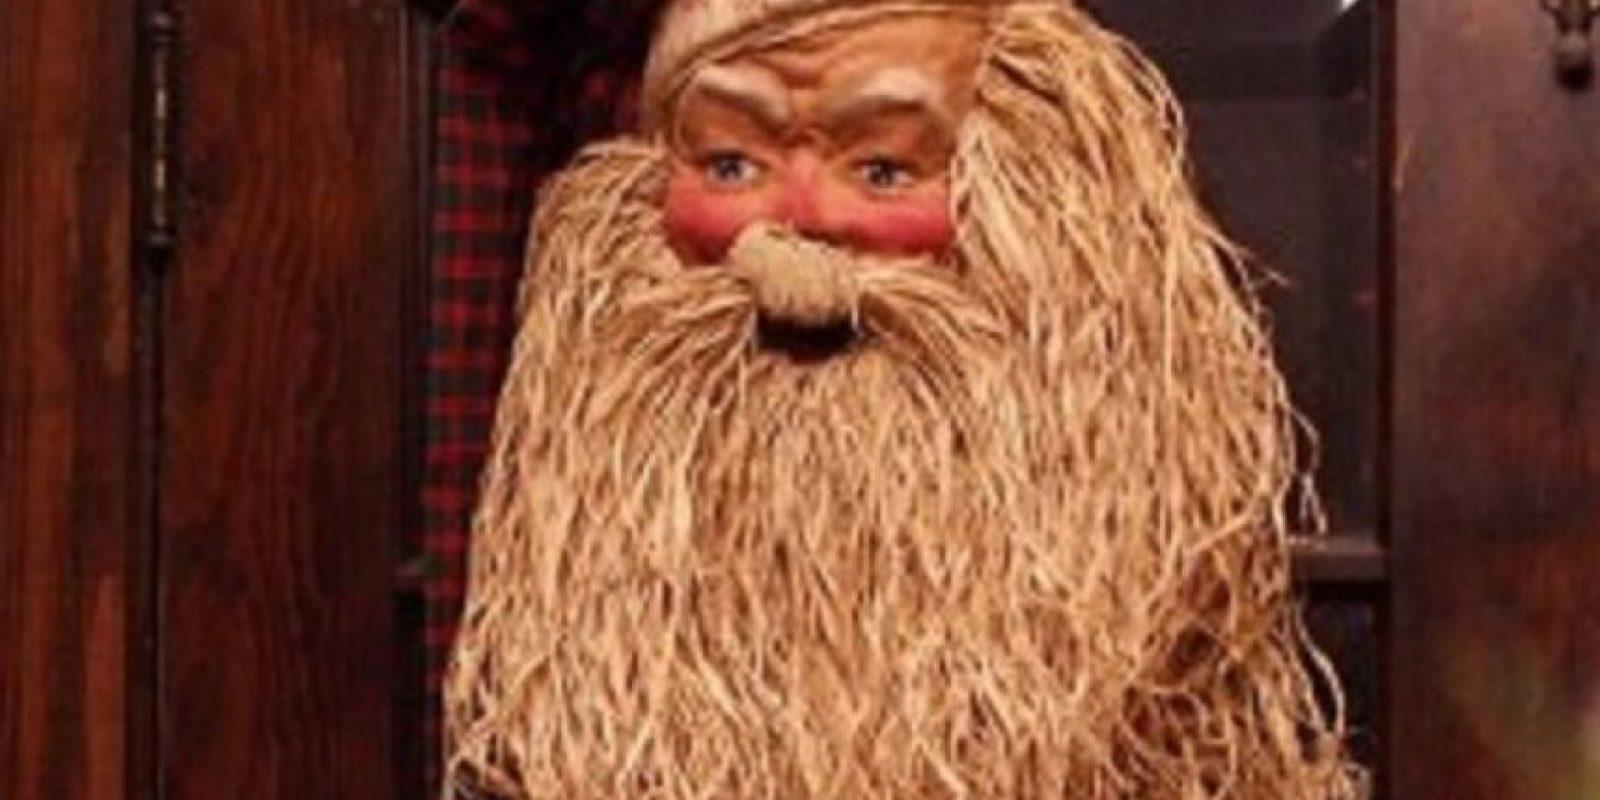 Santa necesita un baño. Foto:Imgur